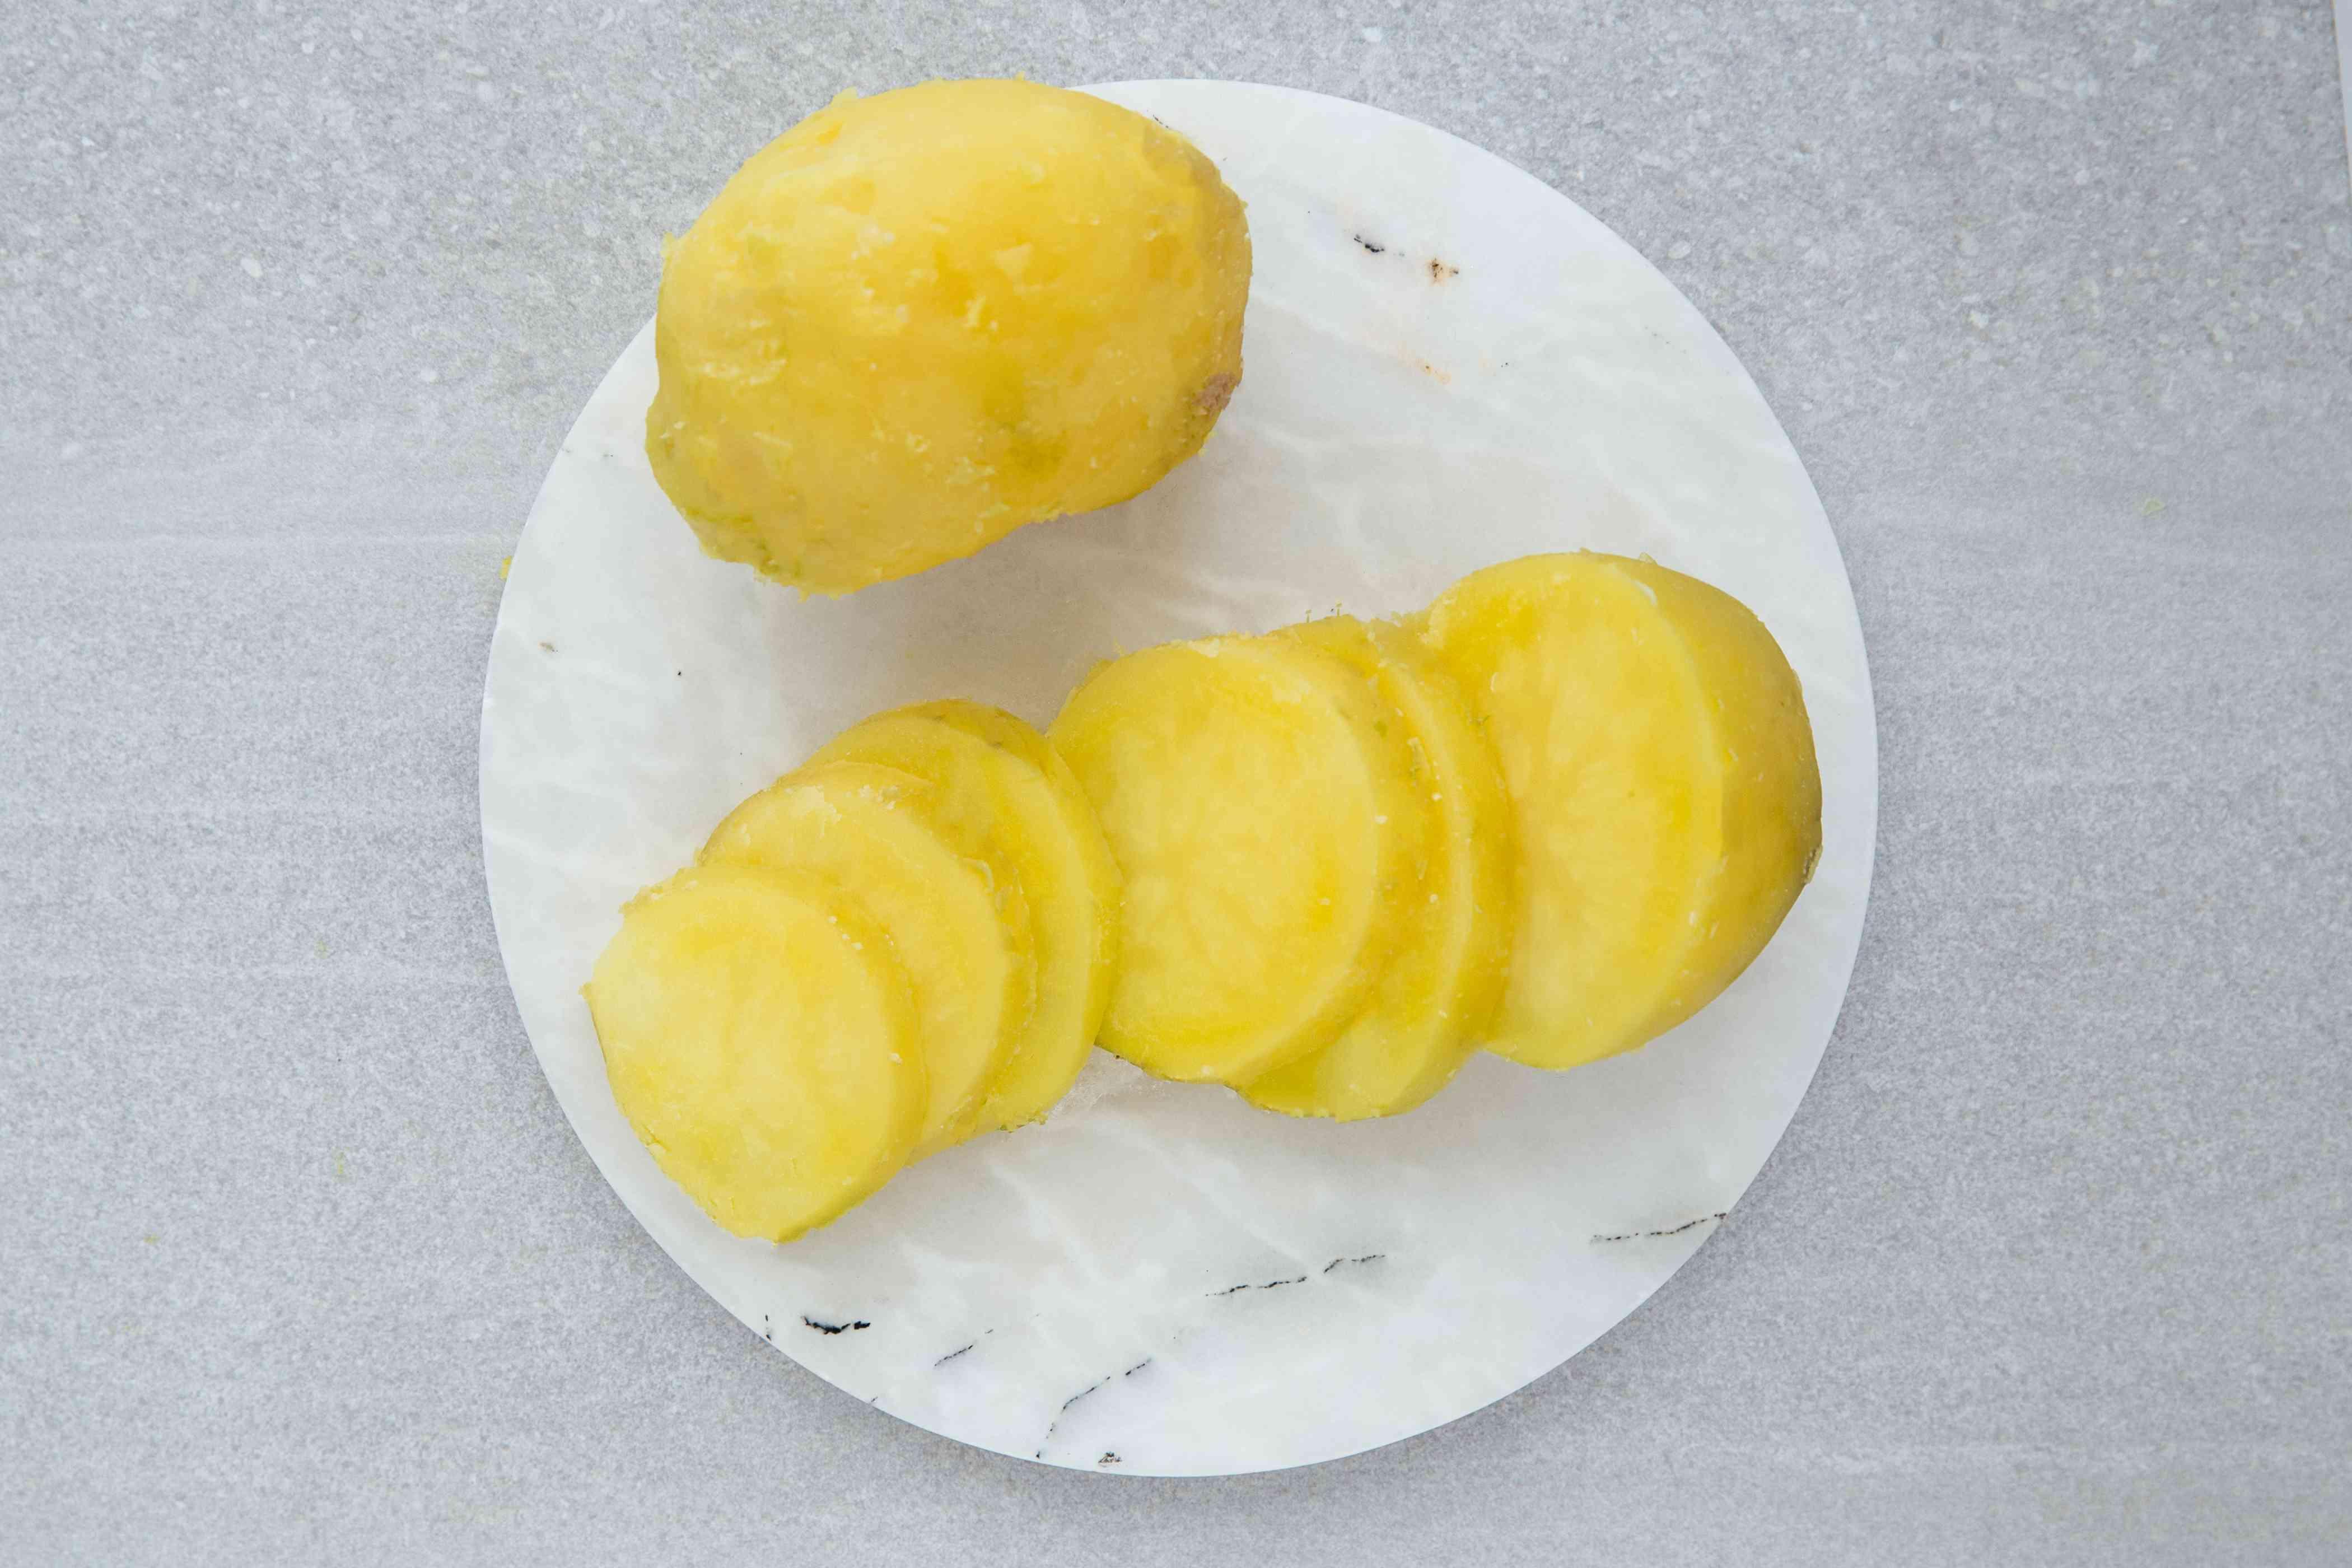 potatoes cut into pieces